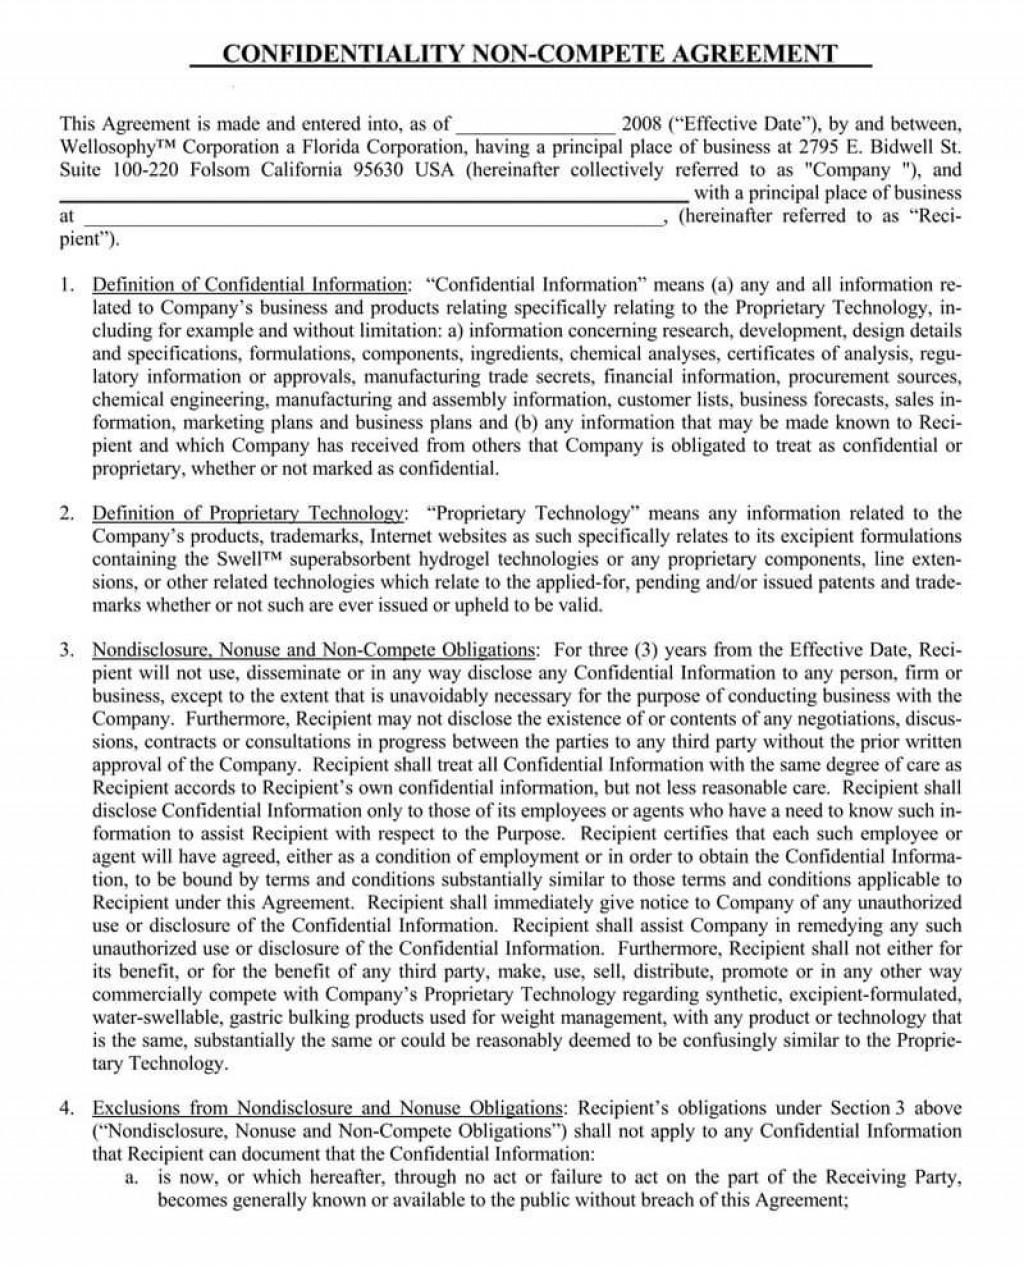 001 Impressive Non Compete Agreement Template Word Photo  Microsoft Non-compete FreeLarge